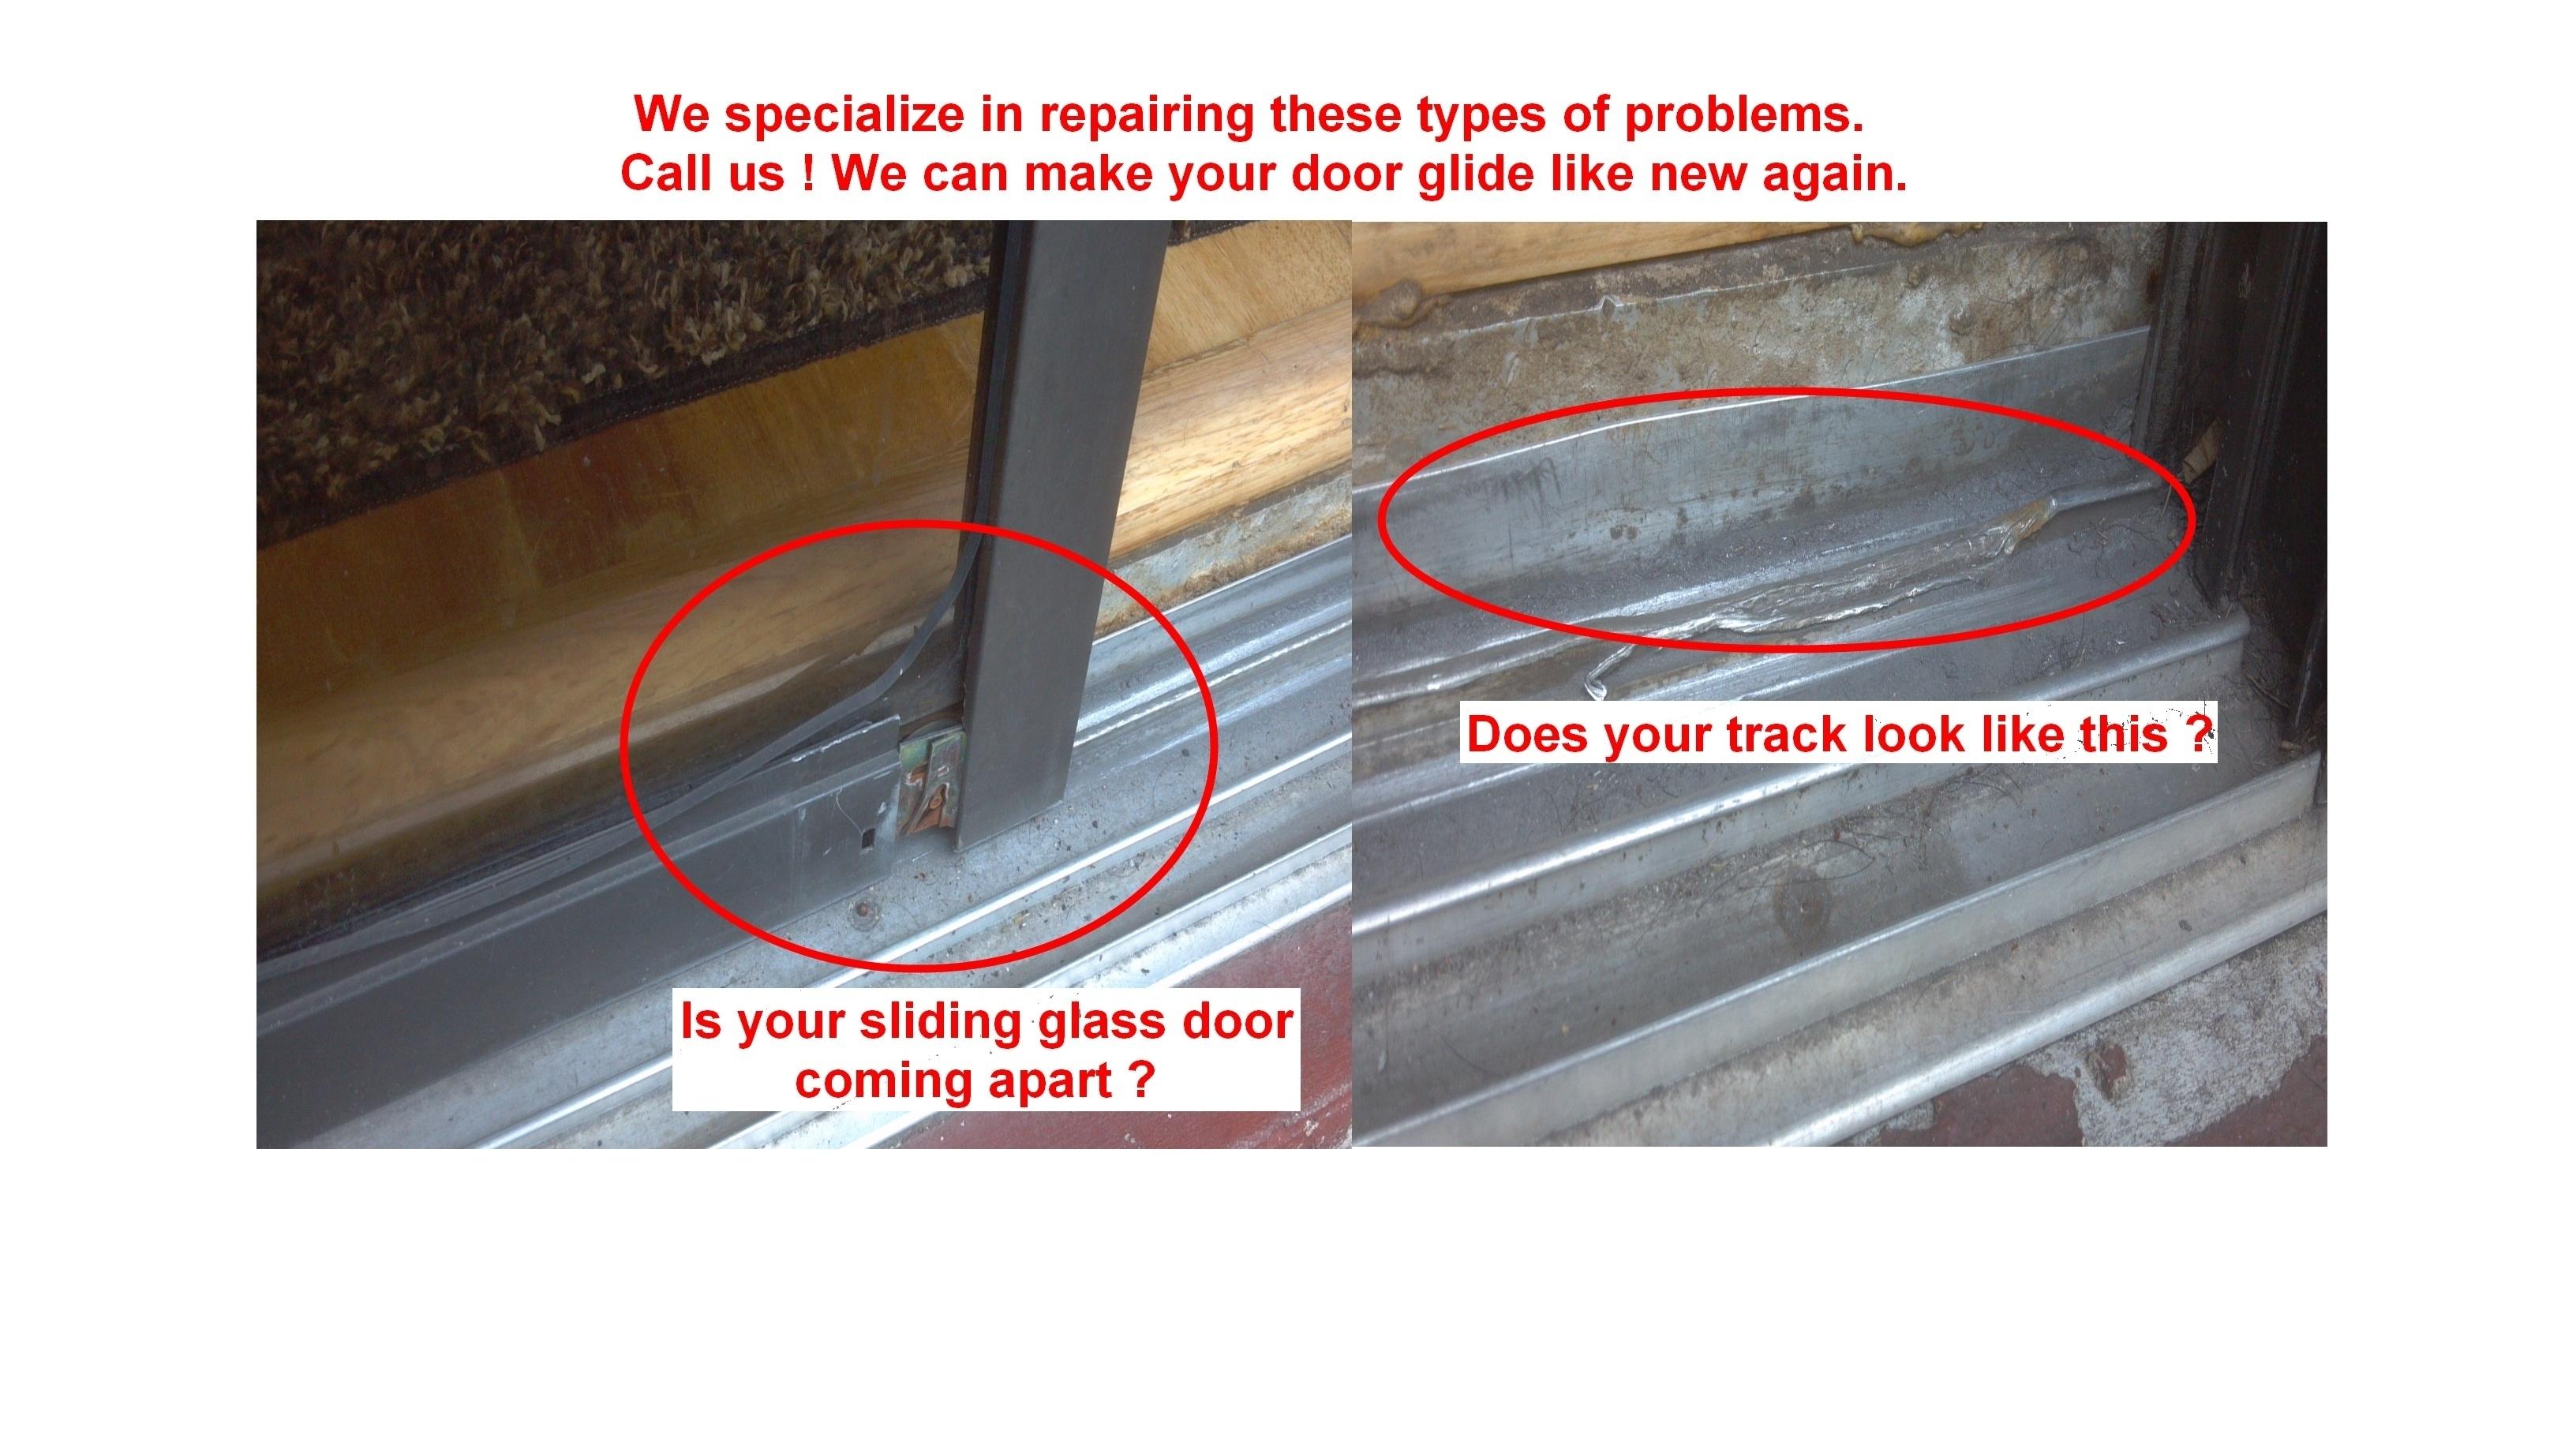 Adjusting Lock On Sliding Glass Door3264 X 1836